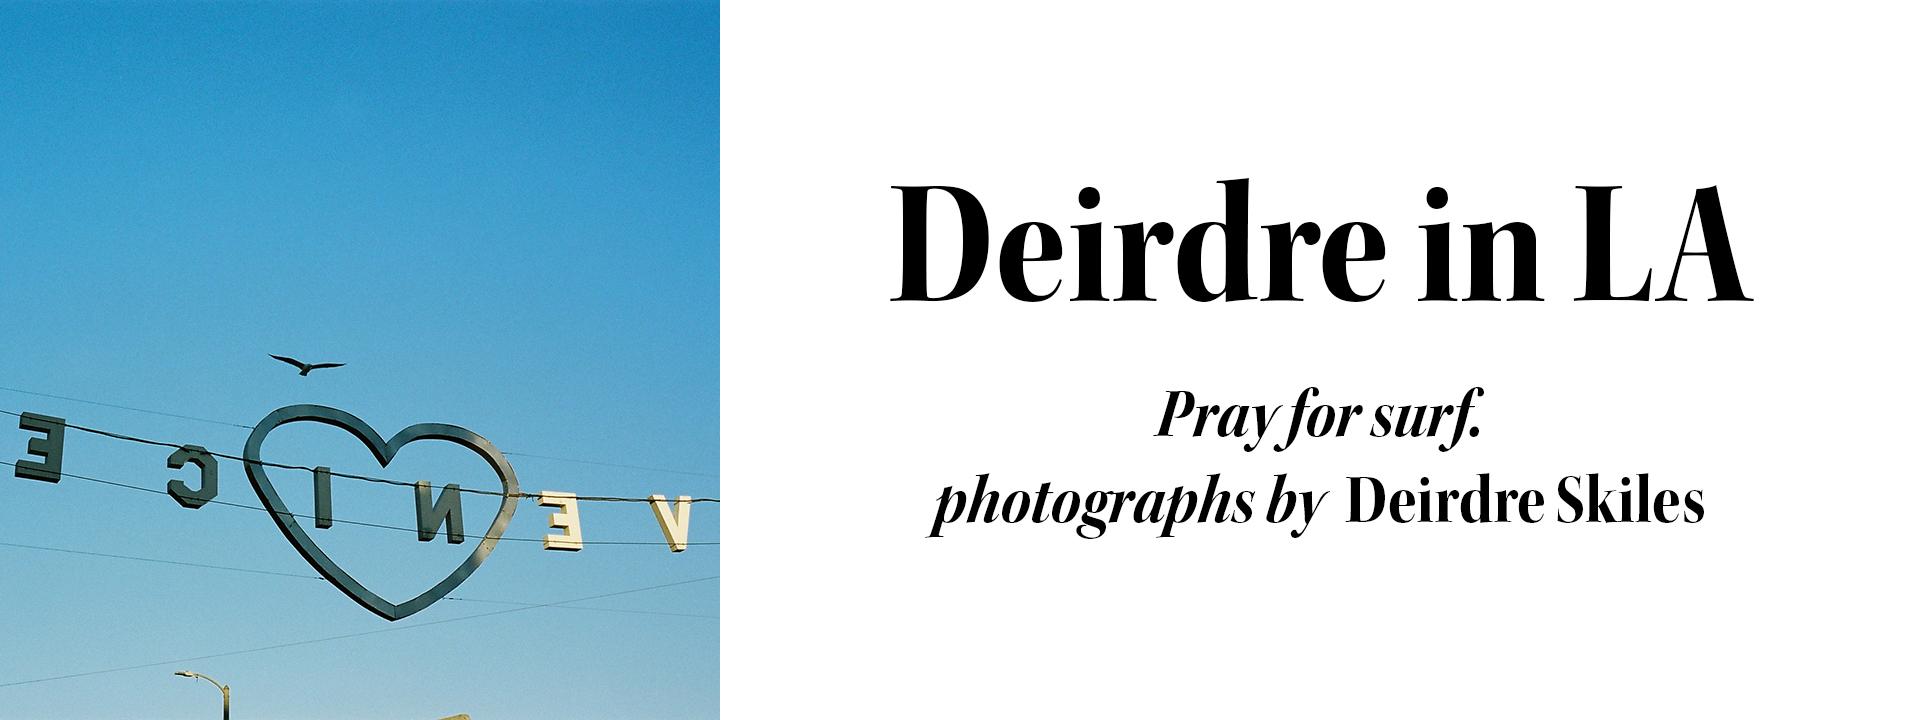 DB_Travel_DeirdreLA_Index.jpg